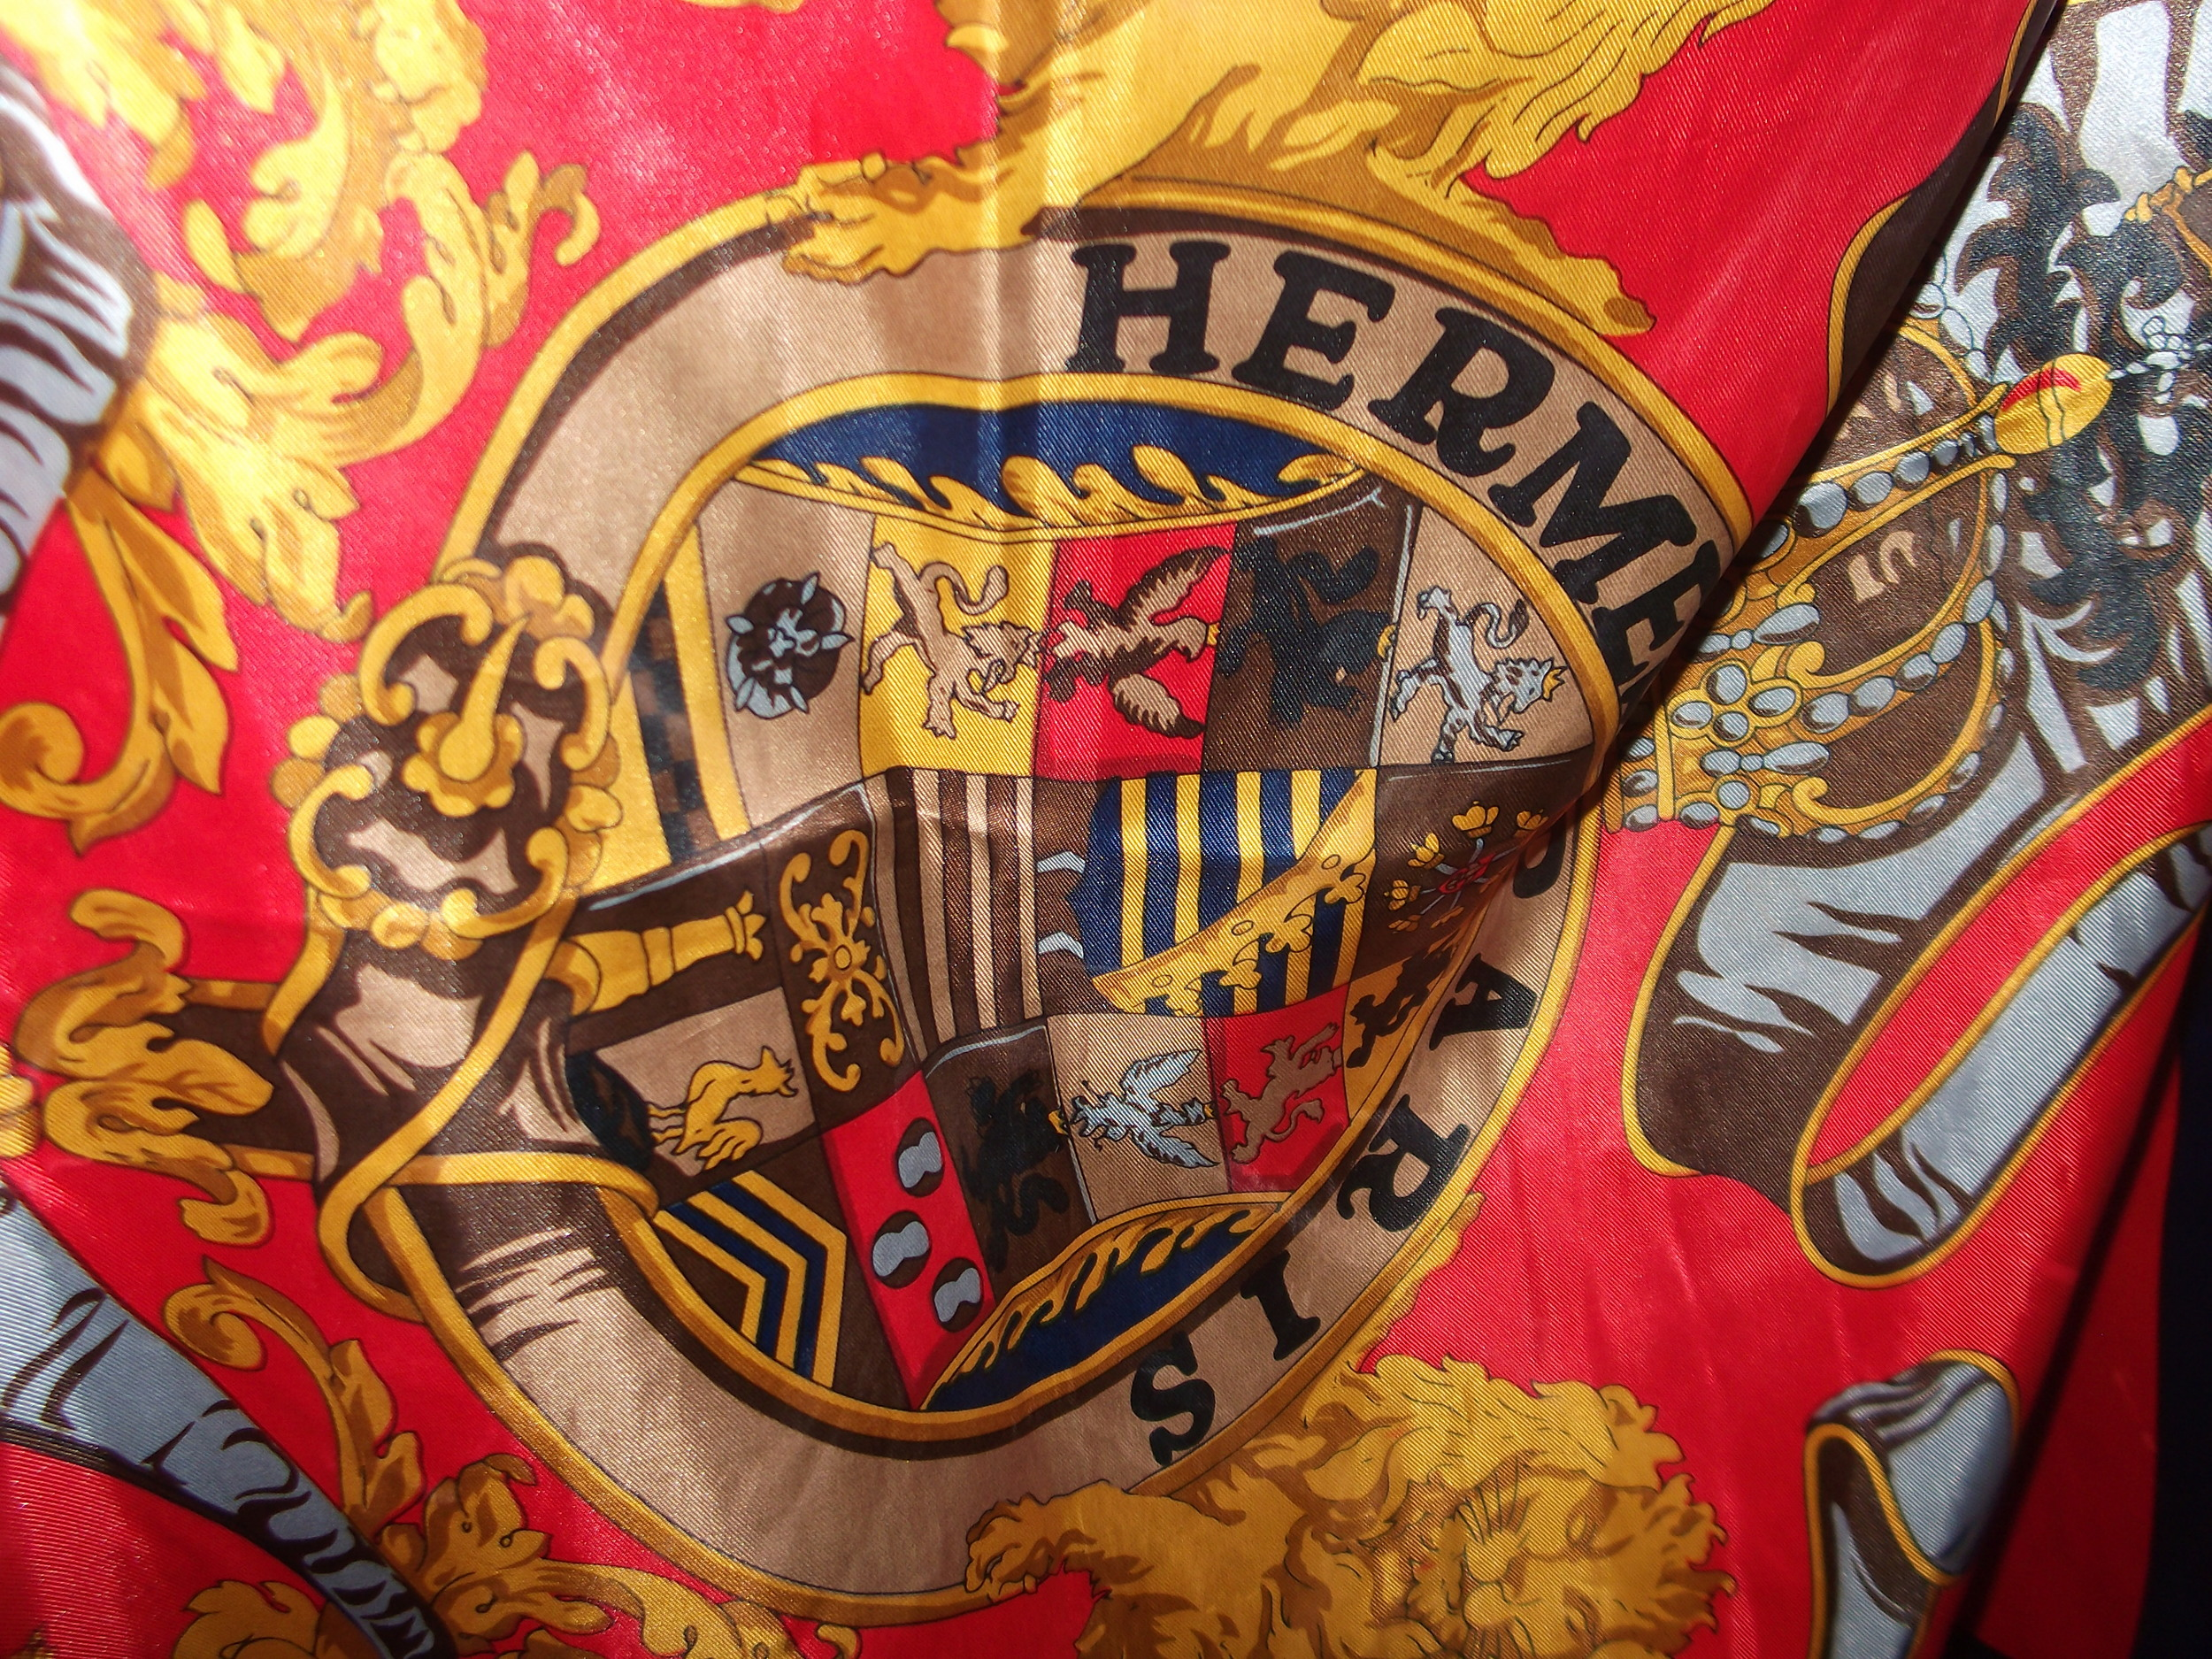 Vintage Hermes Scarf at Pop Up Vintage Fairs London St Stephens Rosslyn Hill Hampstead.JPG